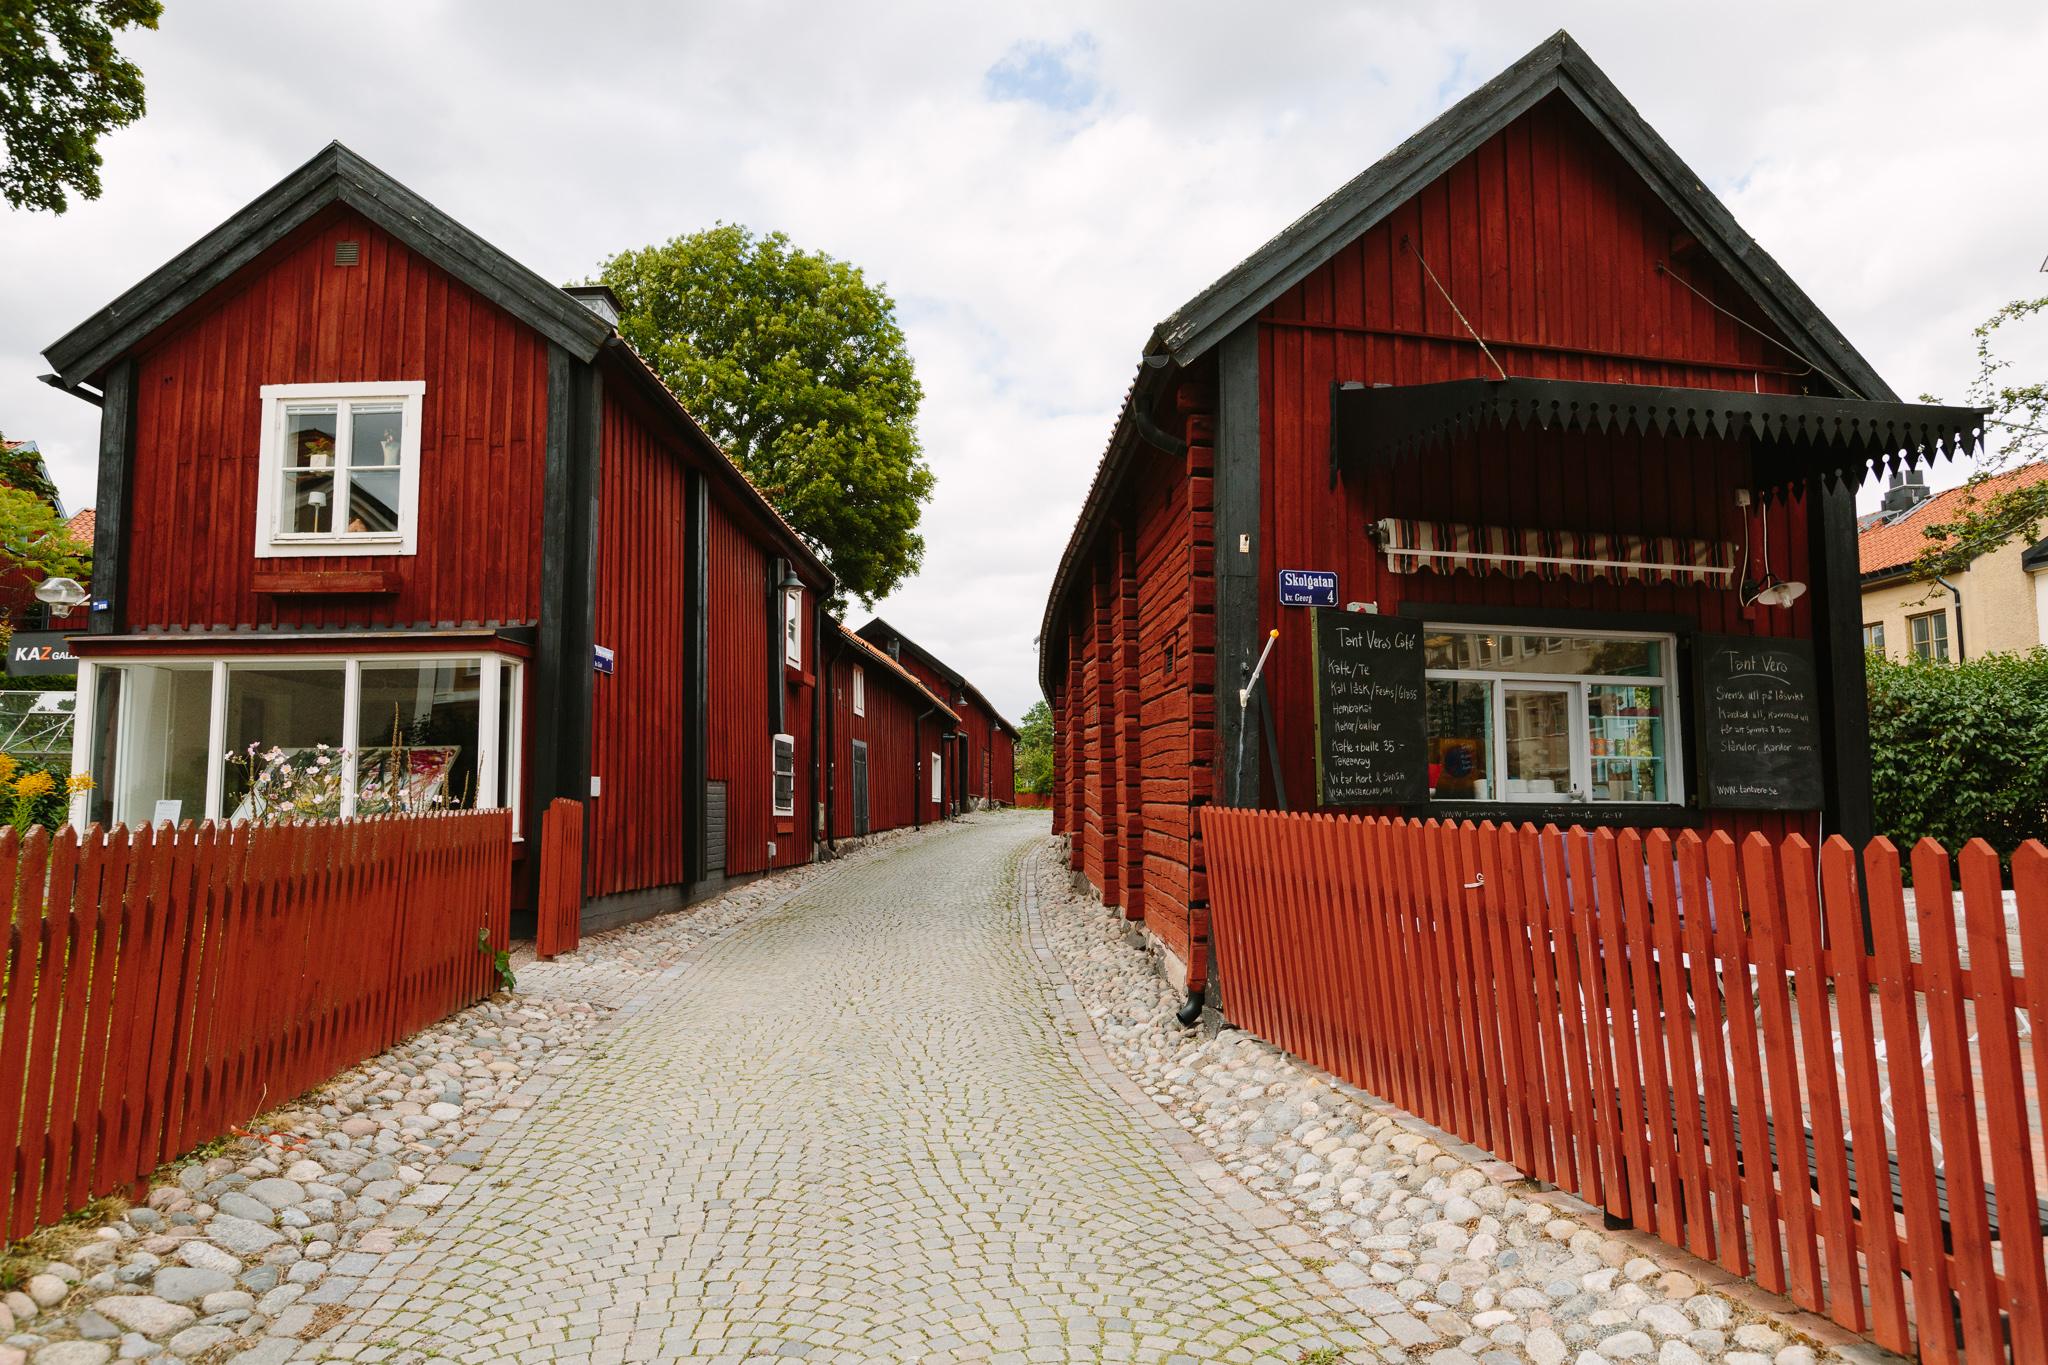 OrebroVasteras_Sweden_blog2016_jenniferleahy-009.jpg